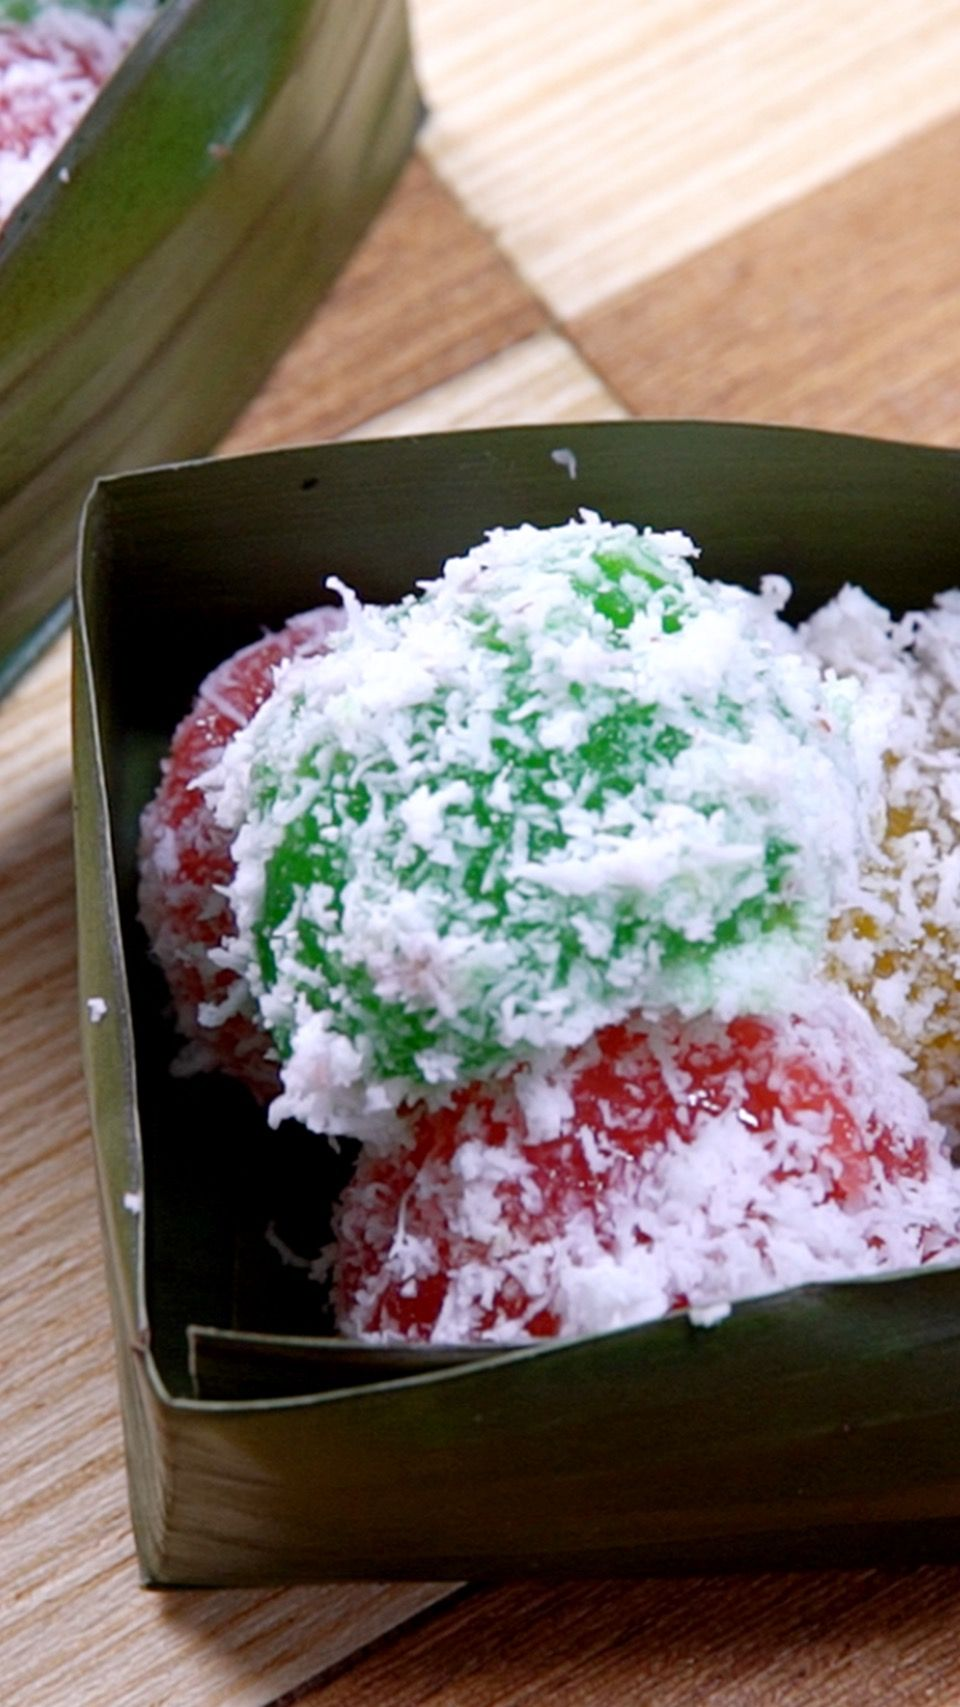 Kue Sentiling Singkong Resep Resep Resep Kue Makanan Ringan Manis